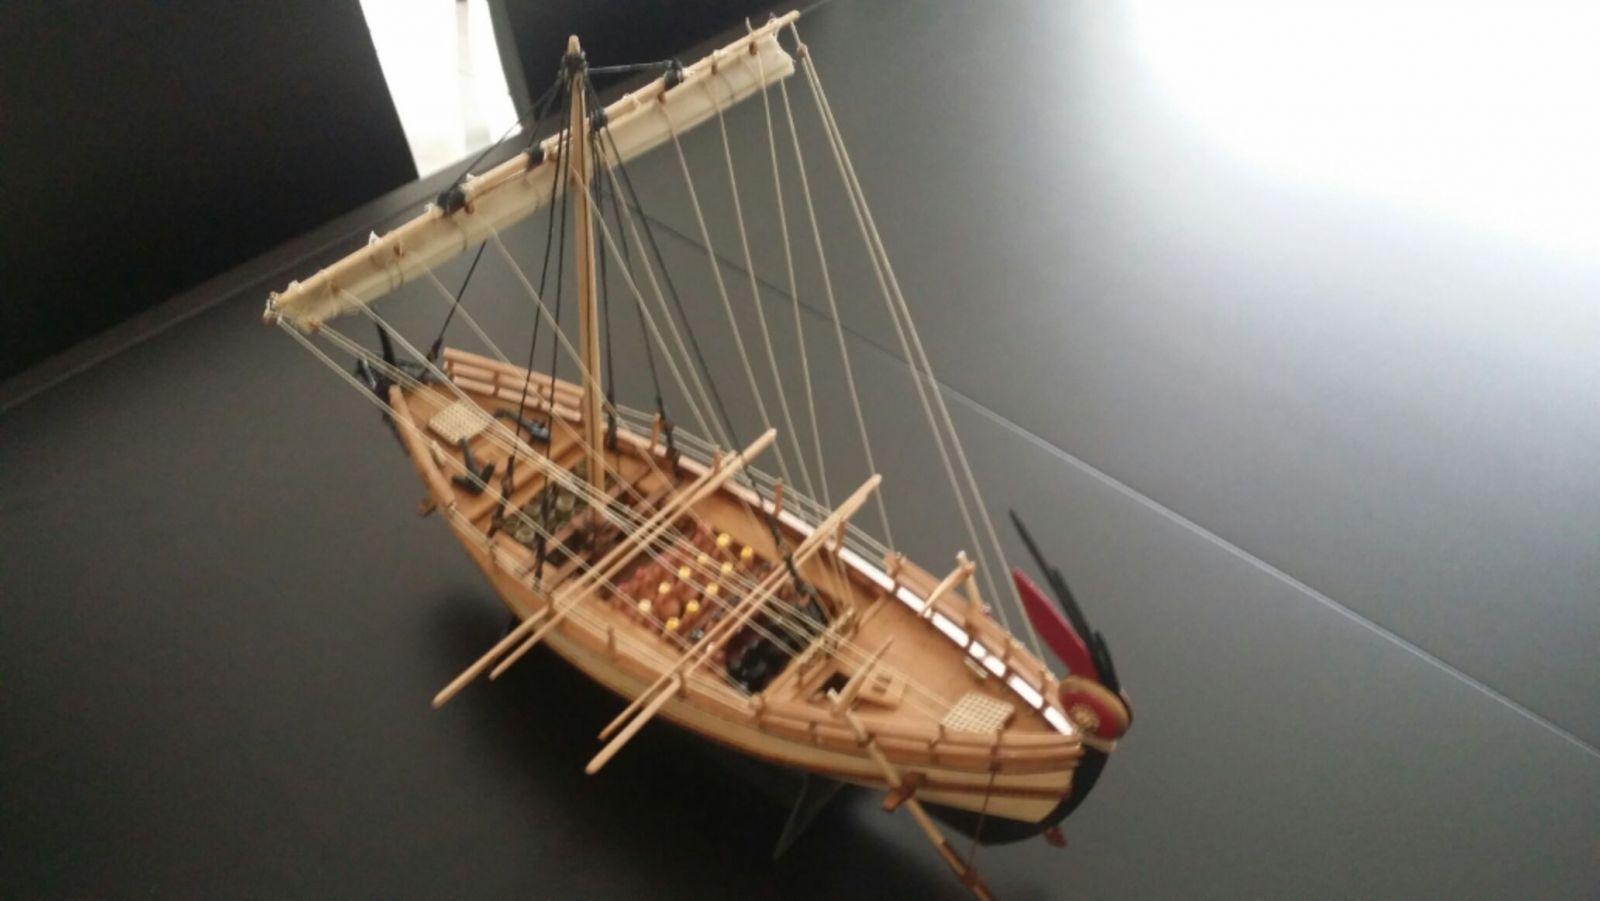 olkas 350bc 1/43 merchant ship of the greek antiquity